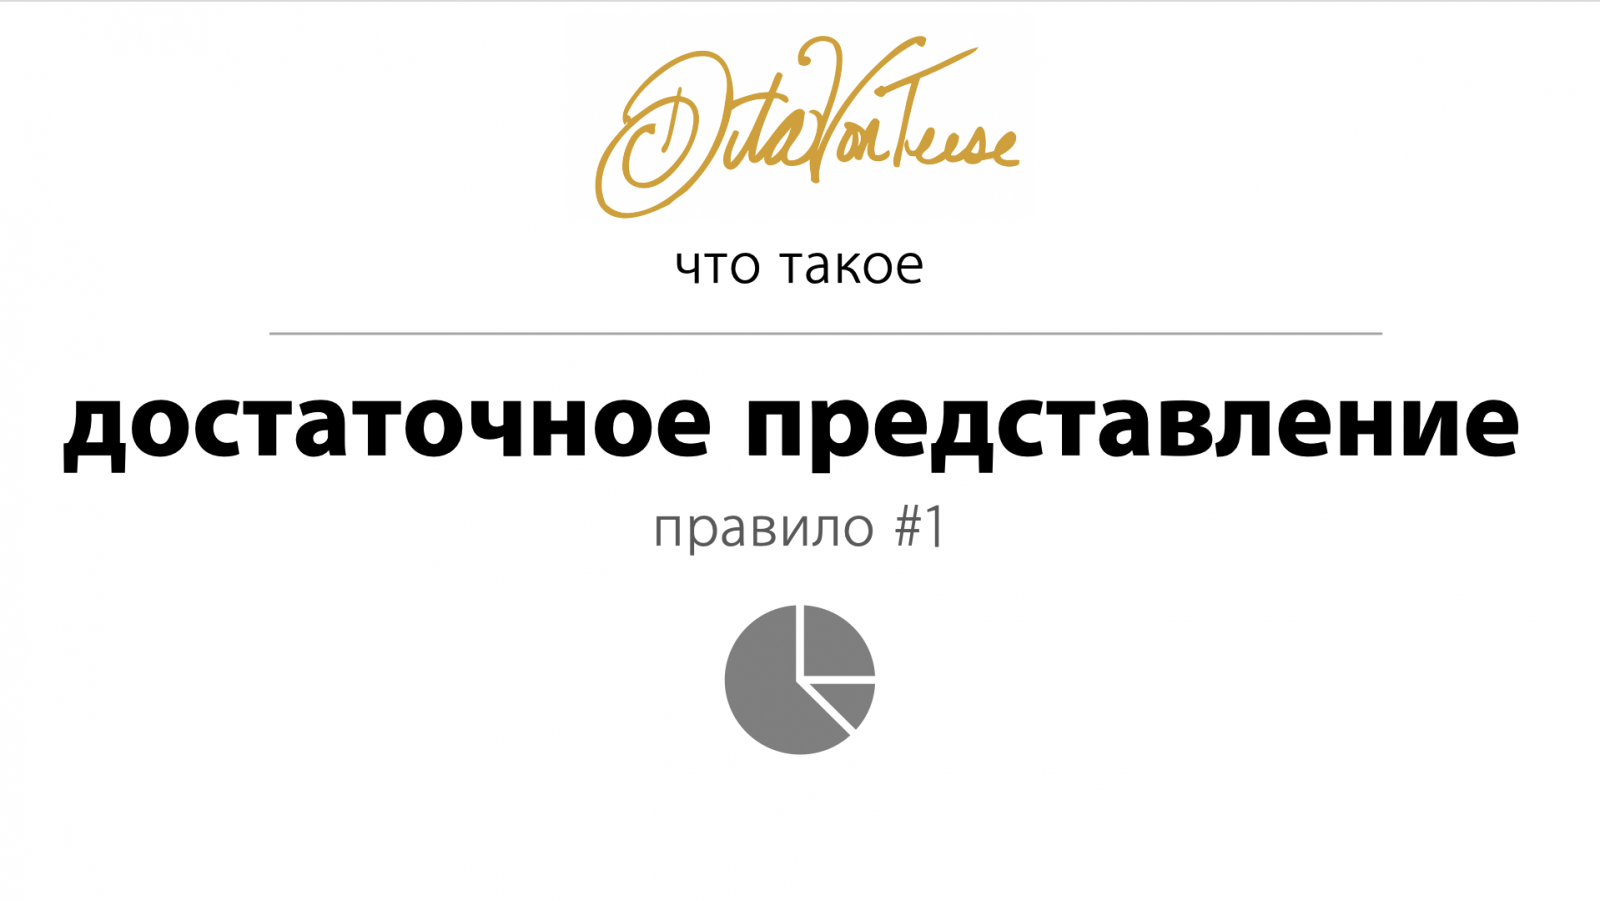 DVT21 - DITA VON TEESE